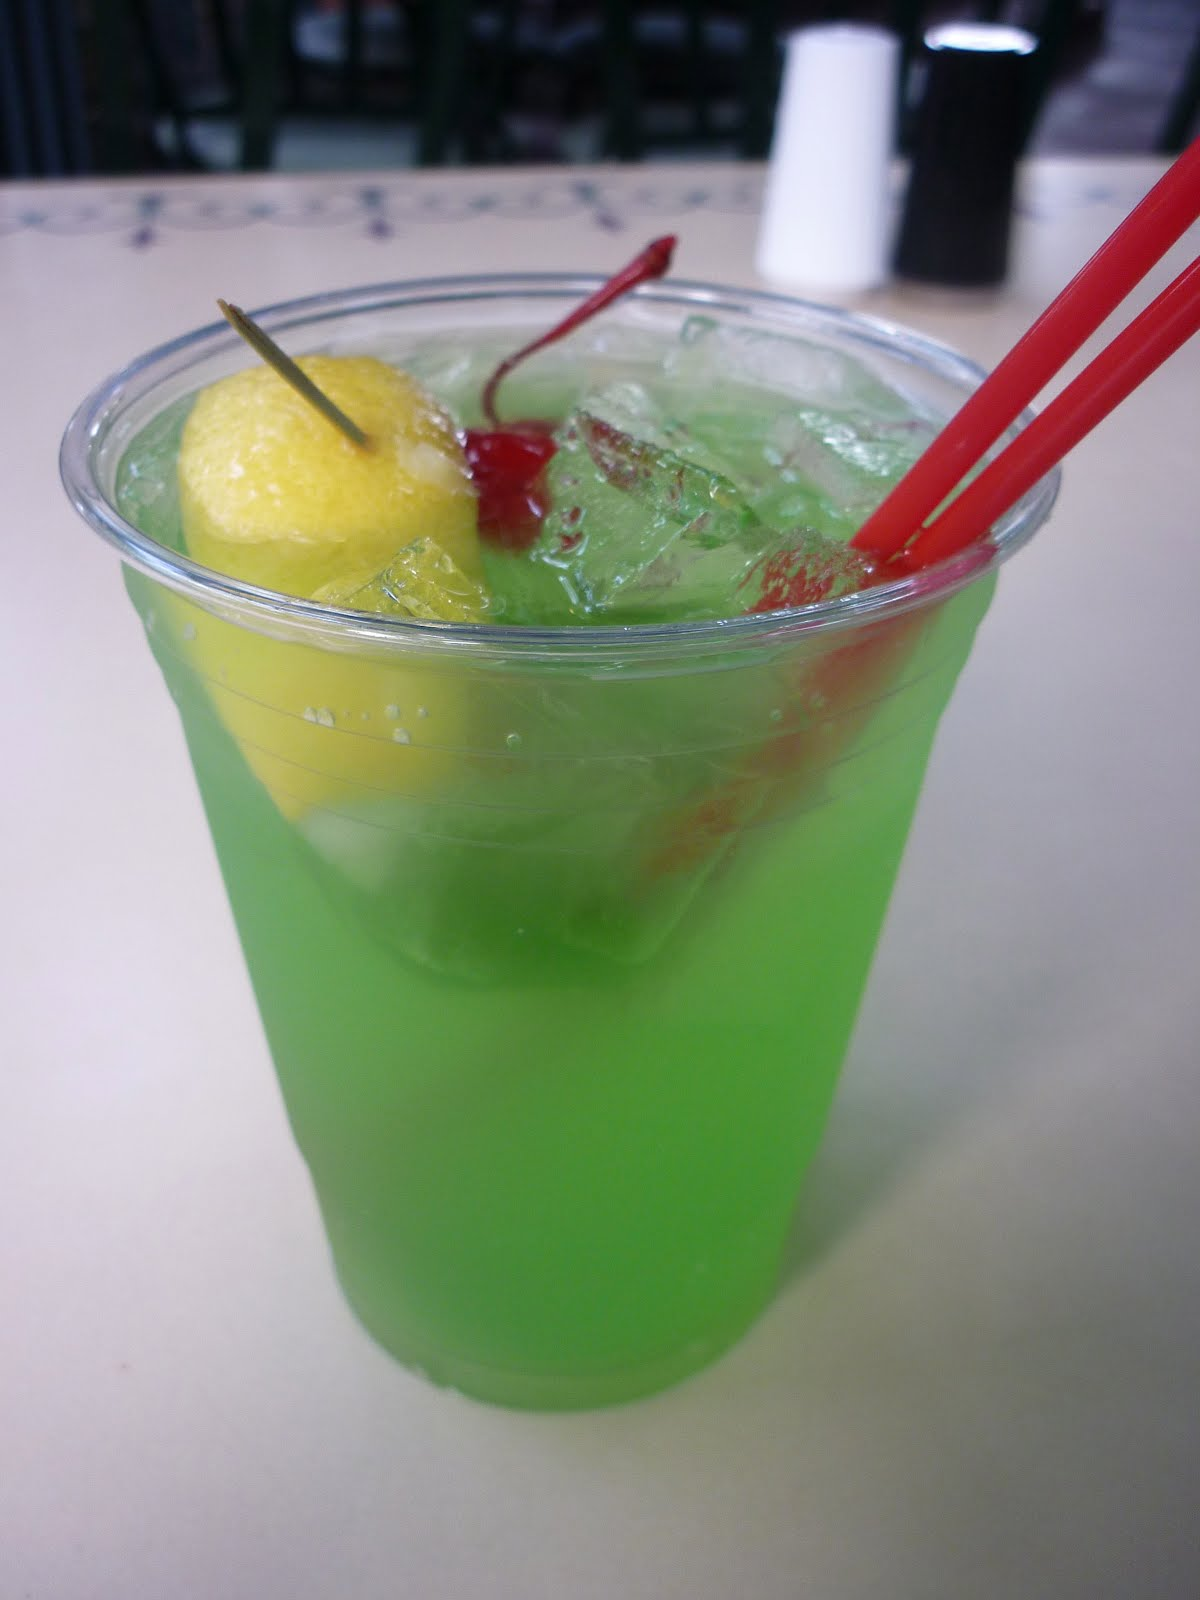 Disney Eats: New Orleans Square: The Mint Julep Bar